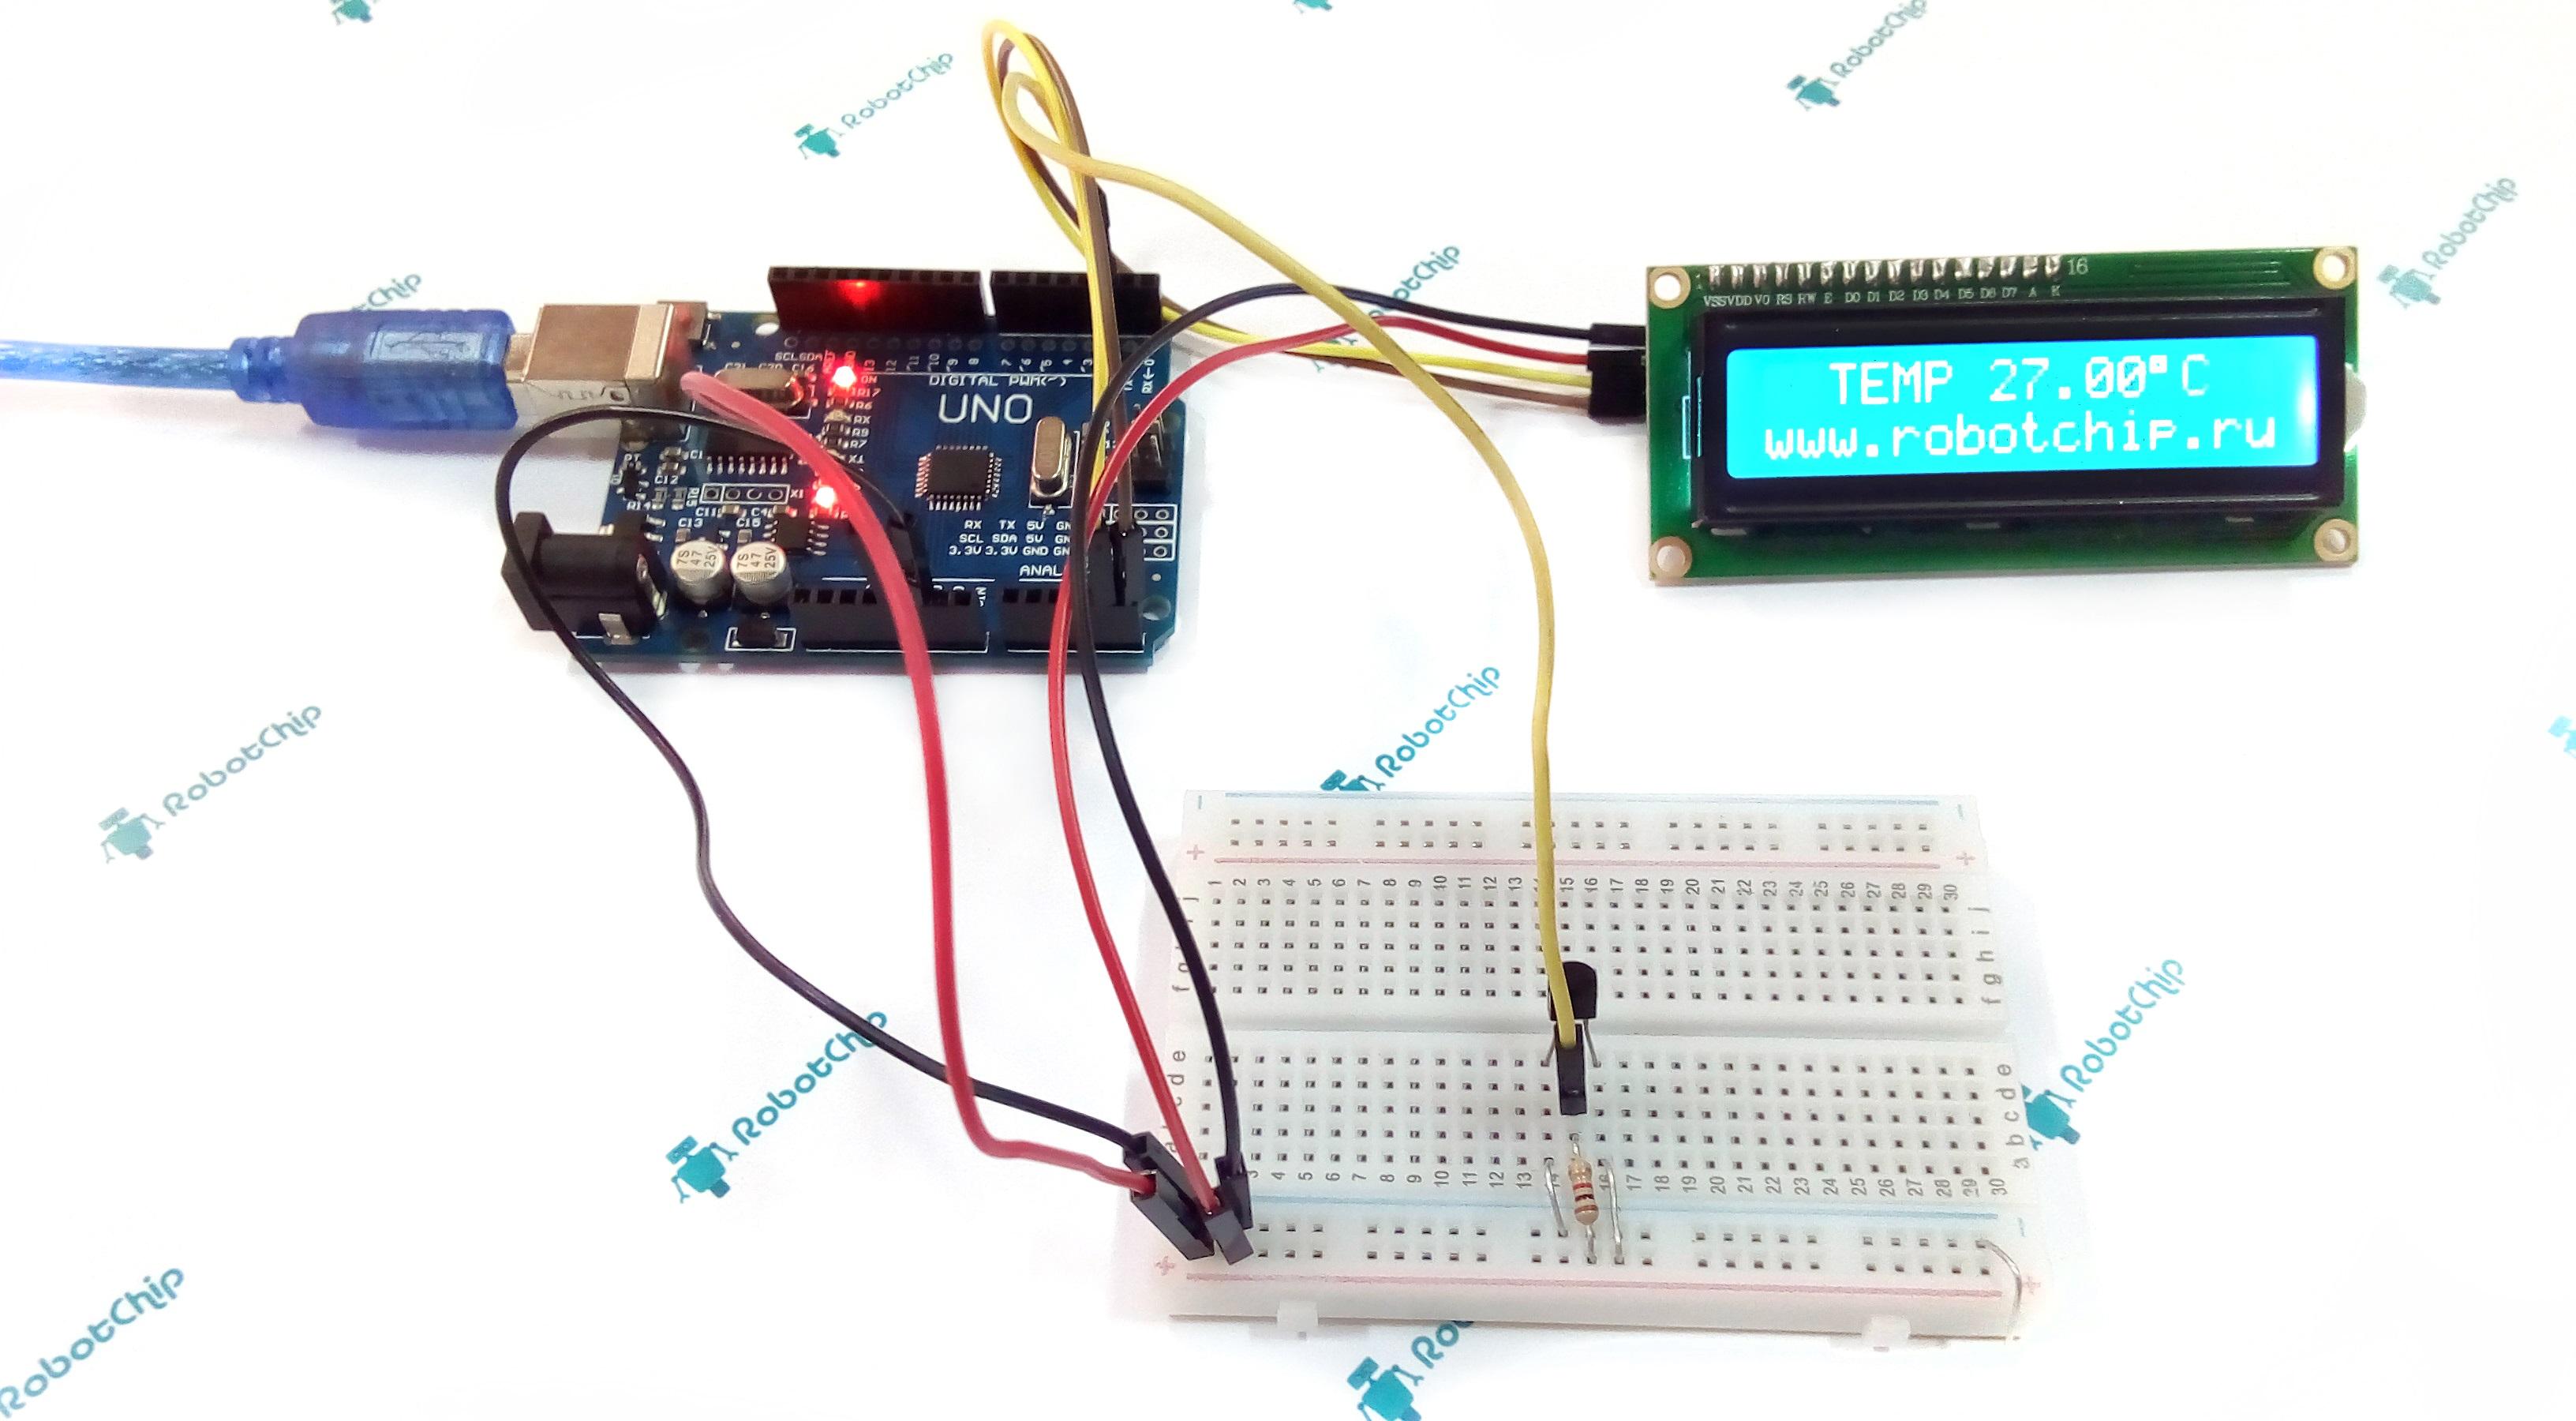 Датчик температуры DS18B20 и LCD дисплей